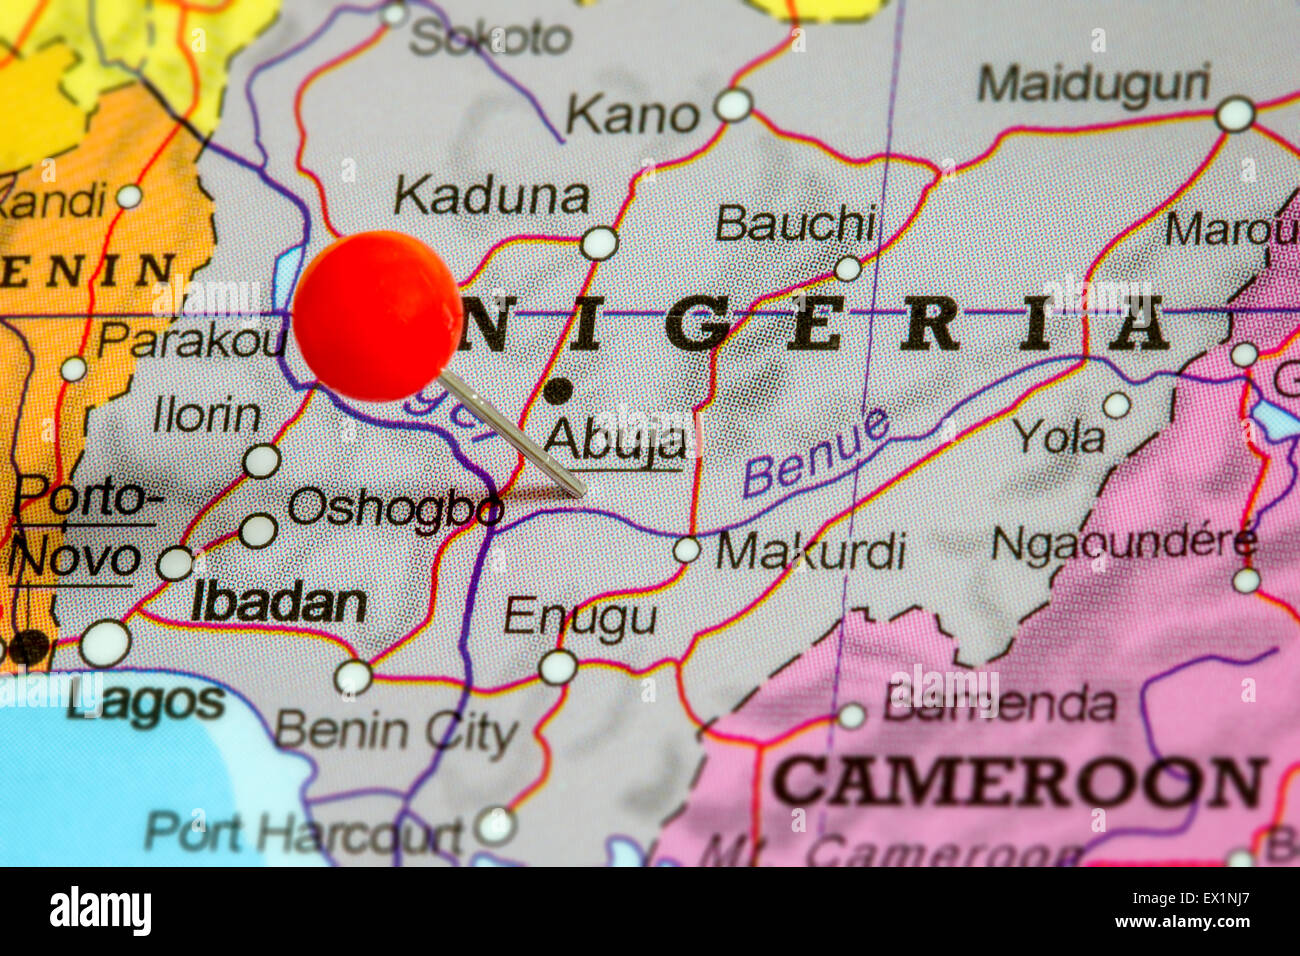 Map Of Nigeria Stock Photos Map Of Nigeria Stock Images Alamy - Map of nigeria